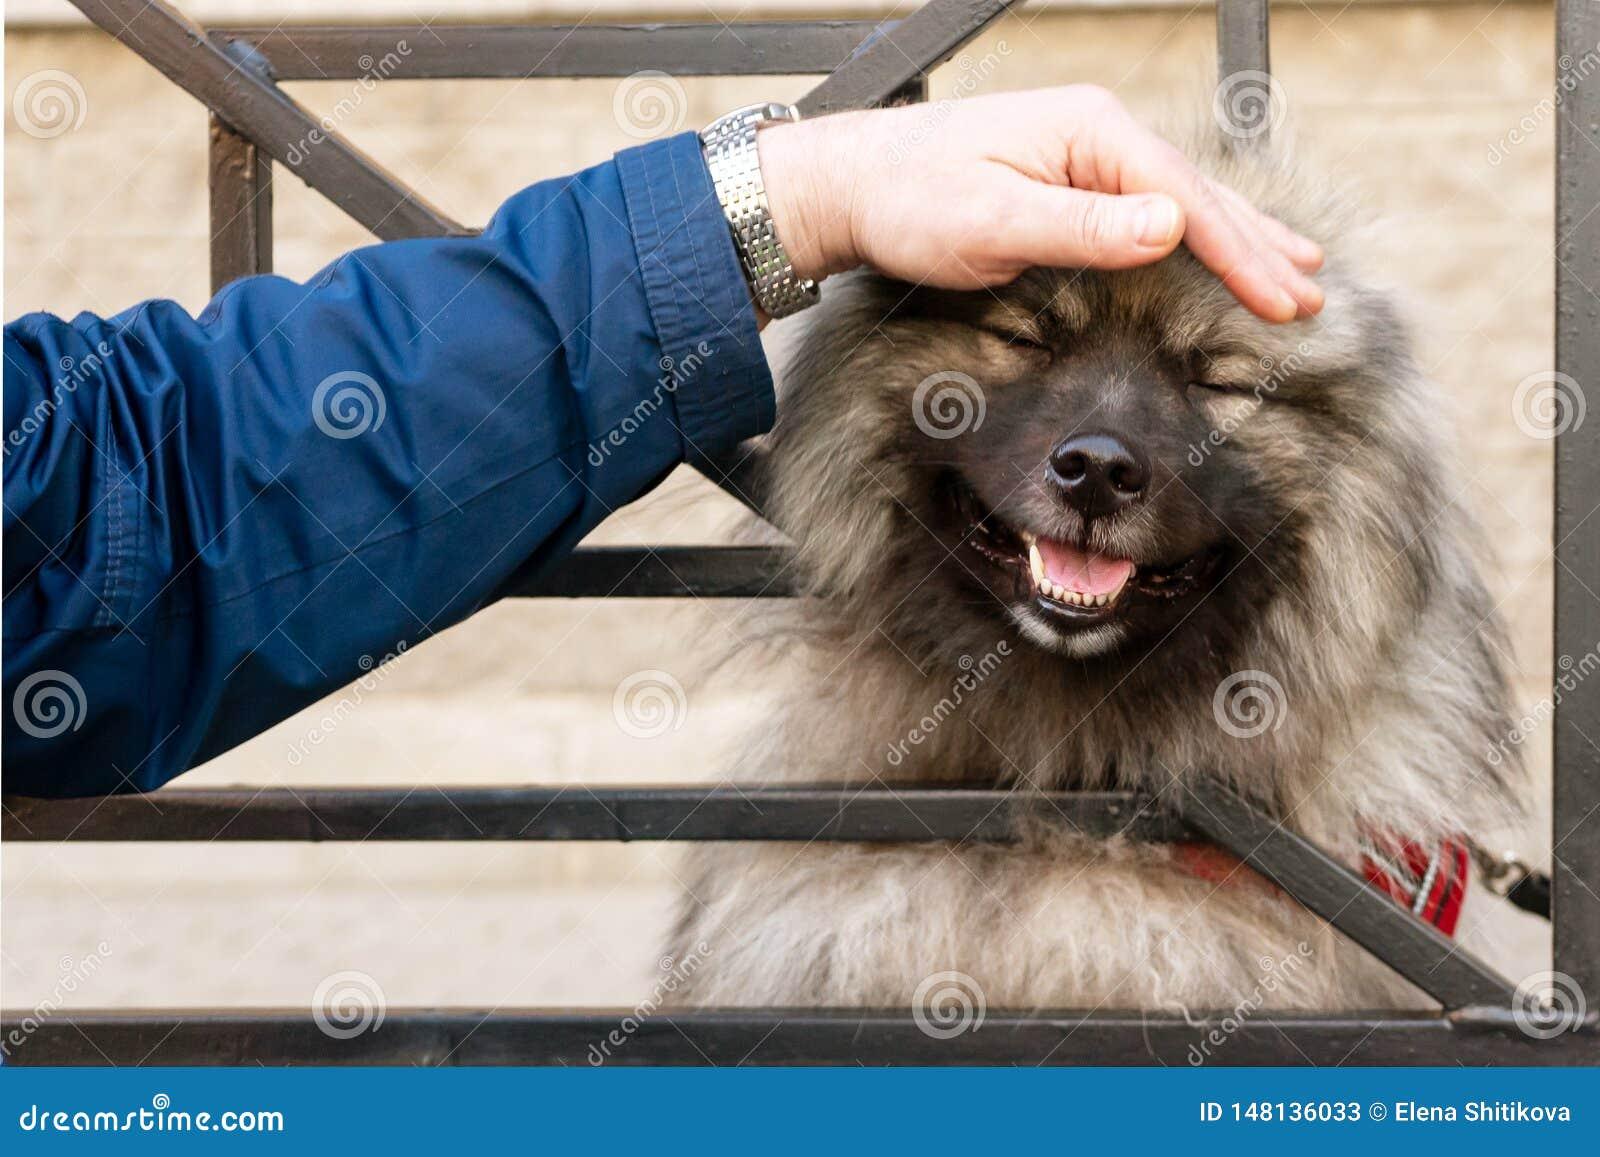 A man`s hand strokes the dog`s head, looking through the bars. Fun dog Wolfschitz.